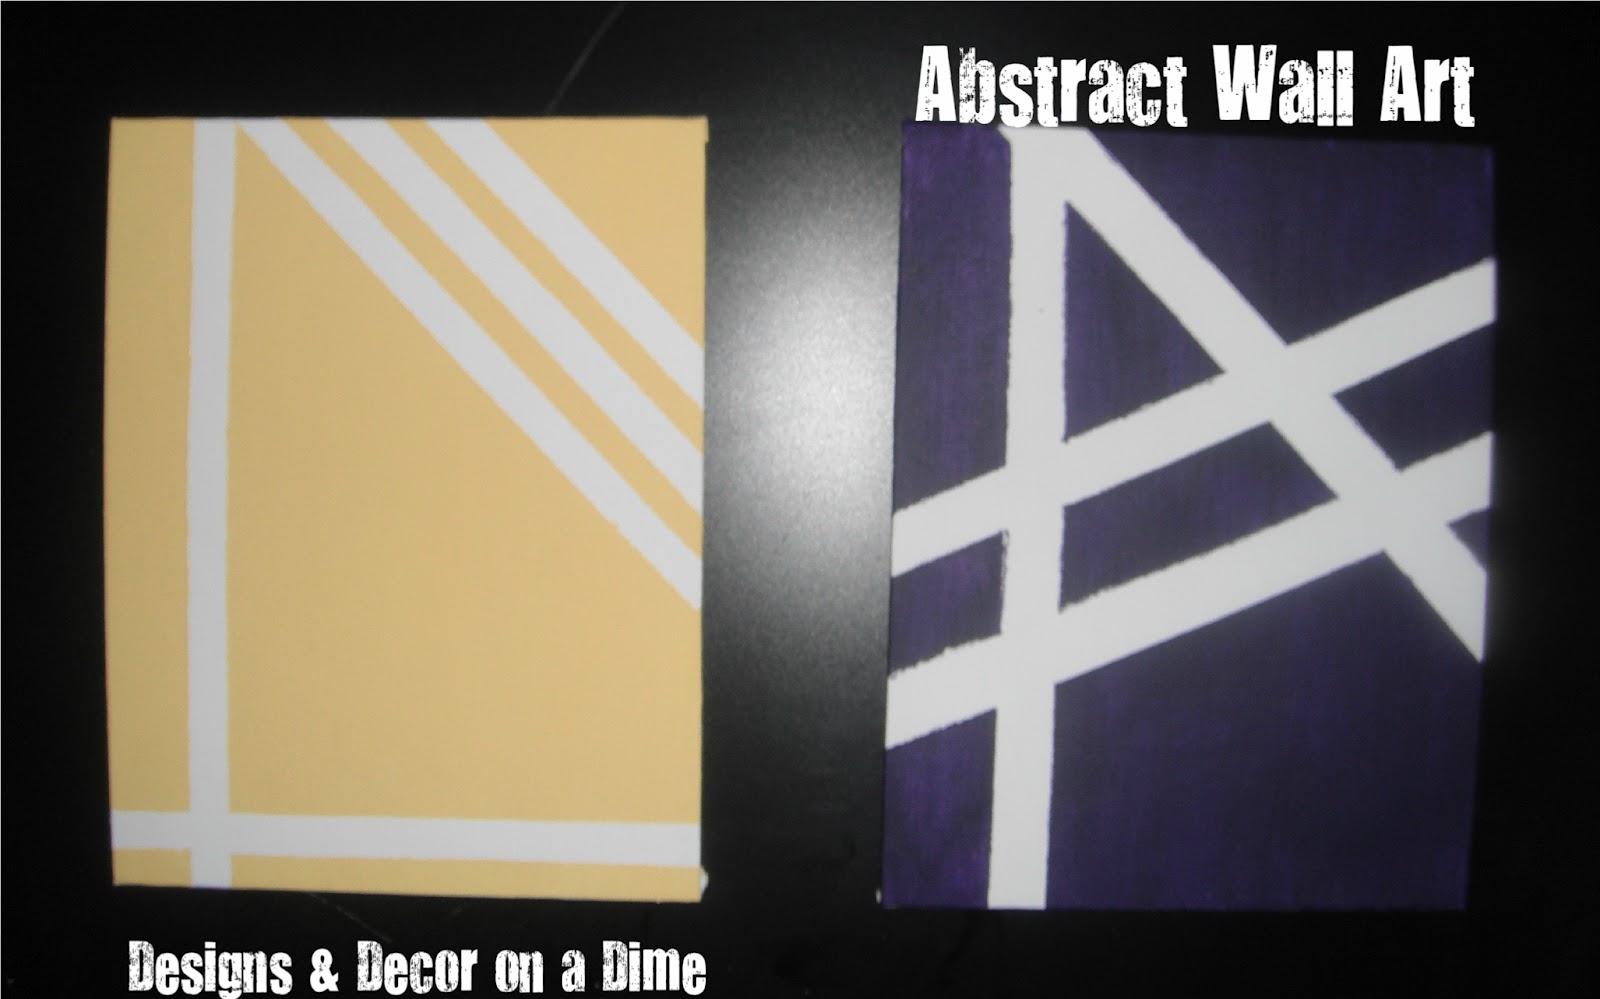 Designs & Decor on a Dime: Canvas Love - Wall Art